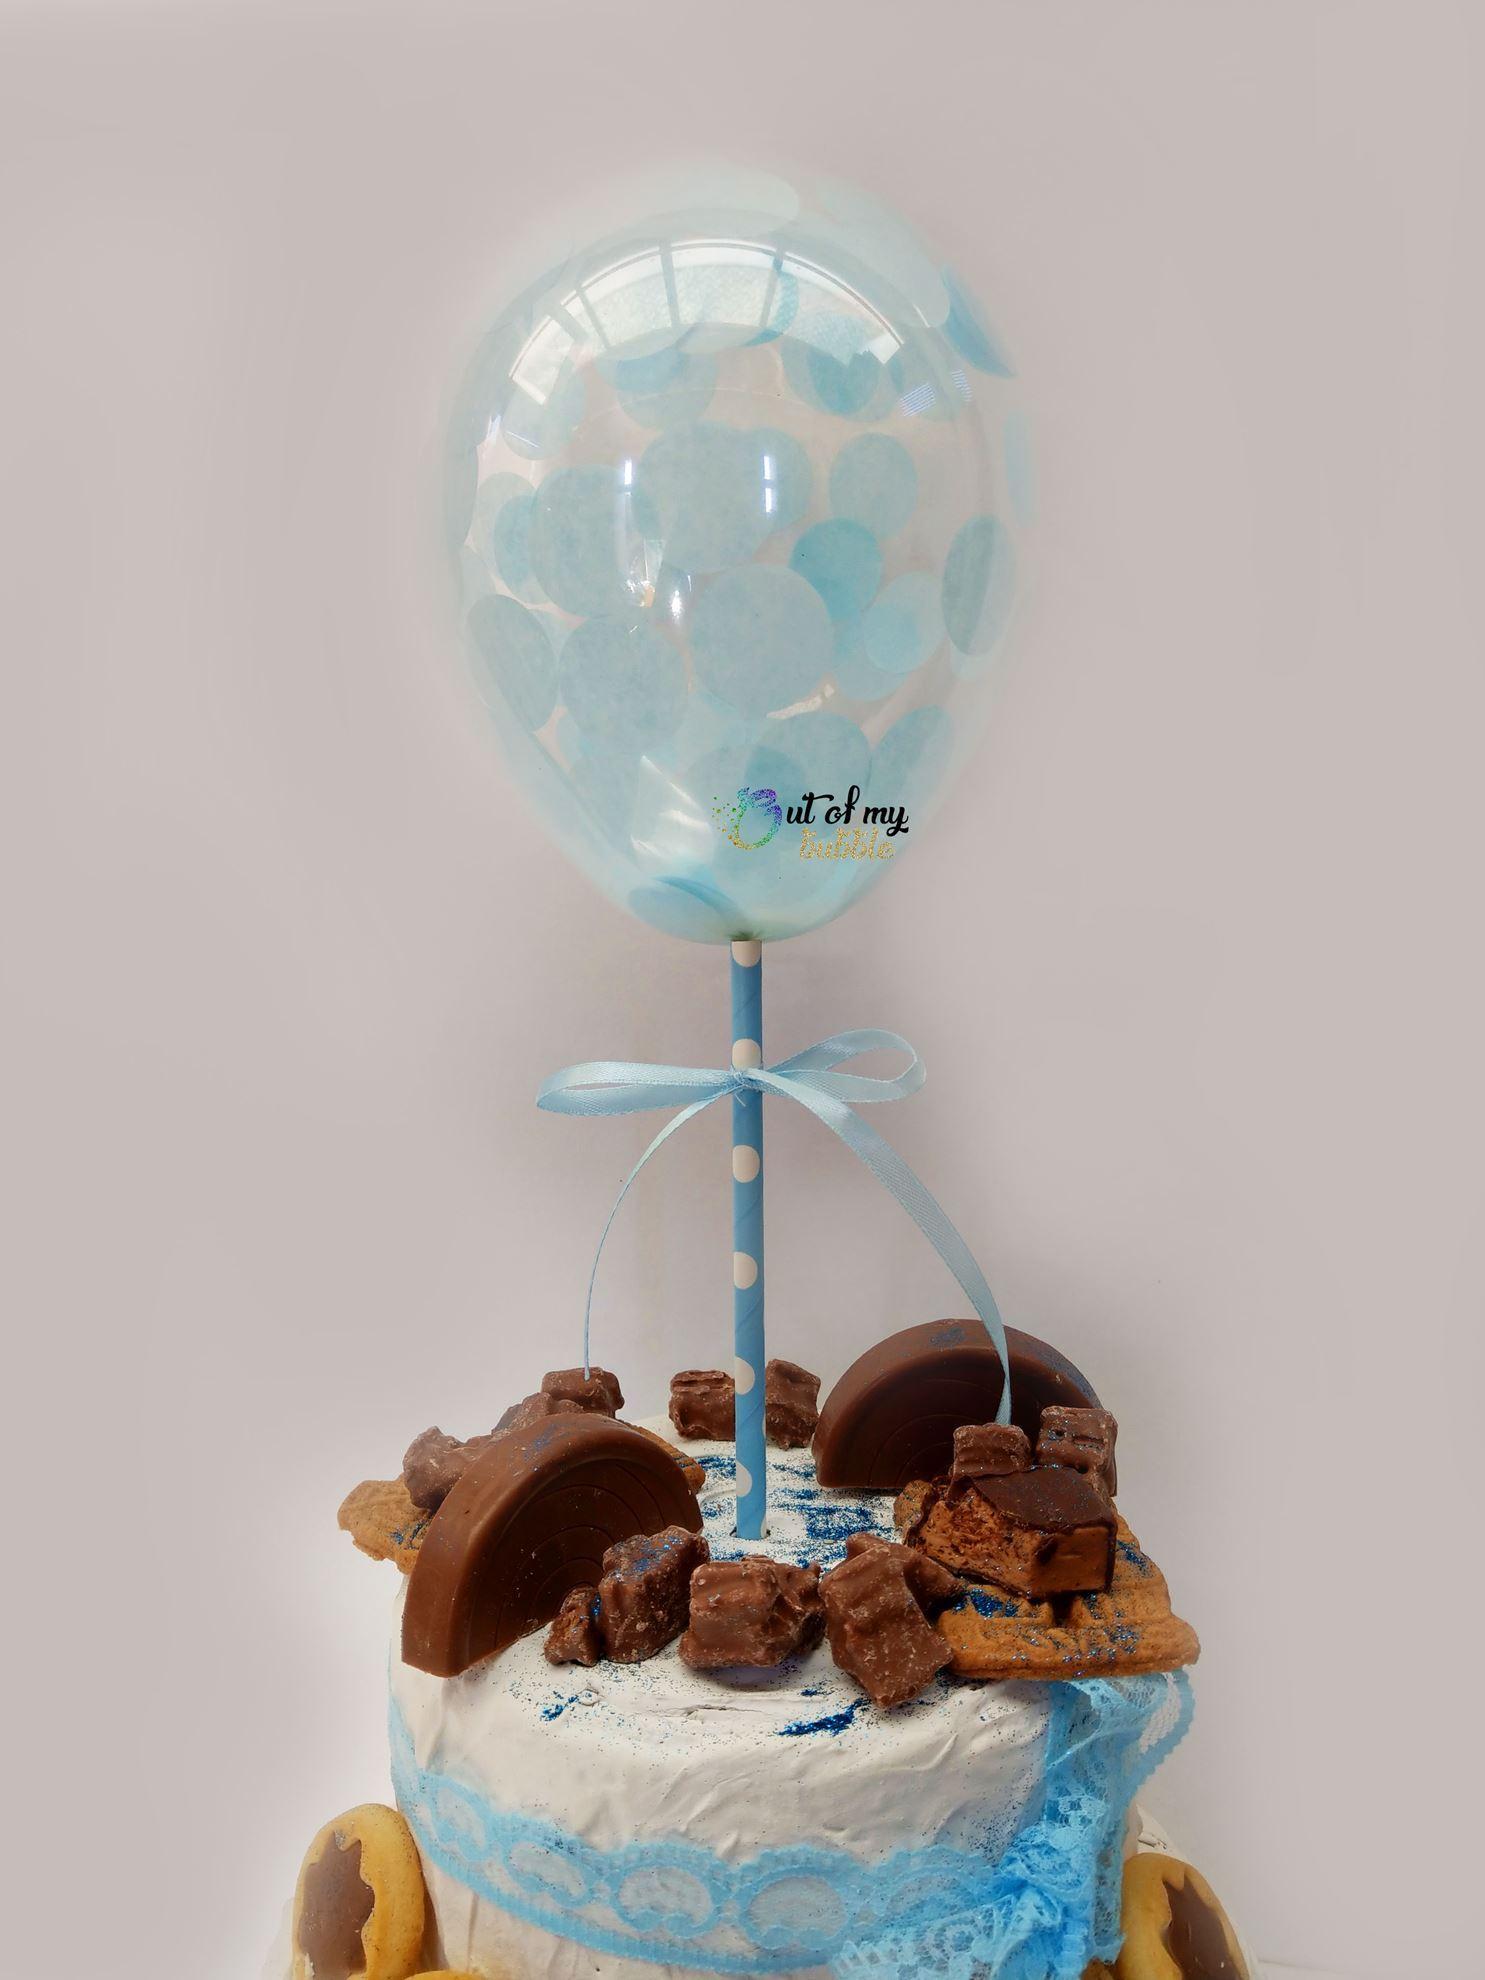 Outofmybubble Blue Confetti Balloon Cake Topper